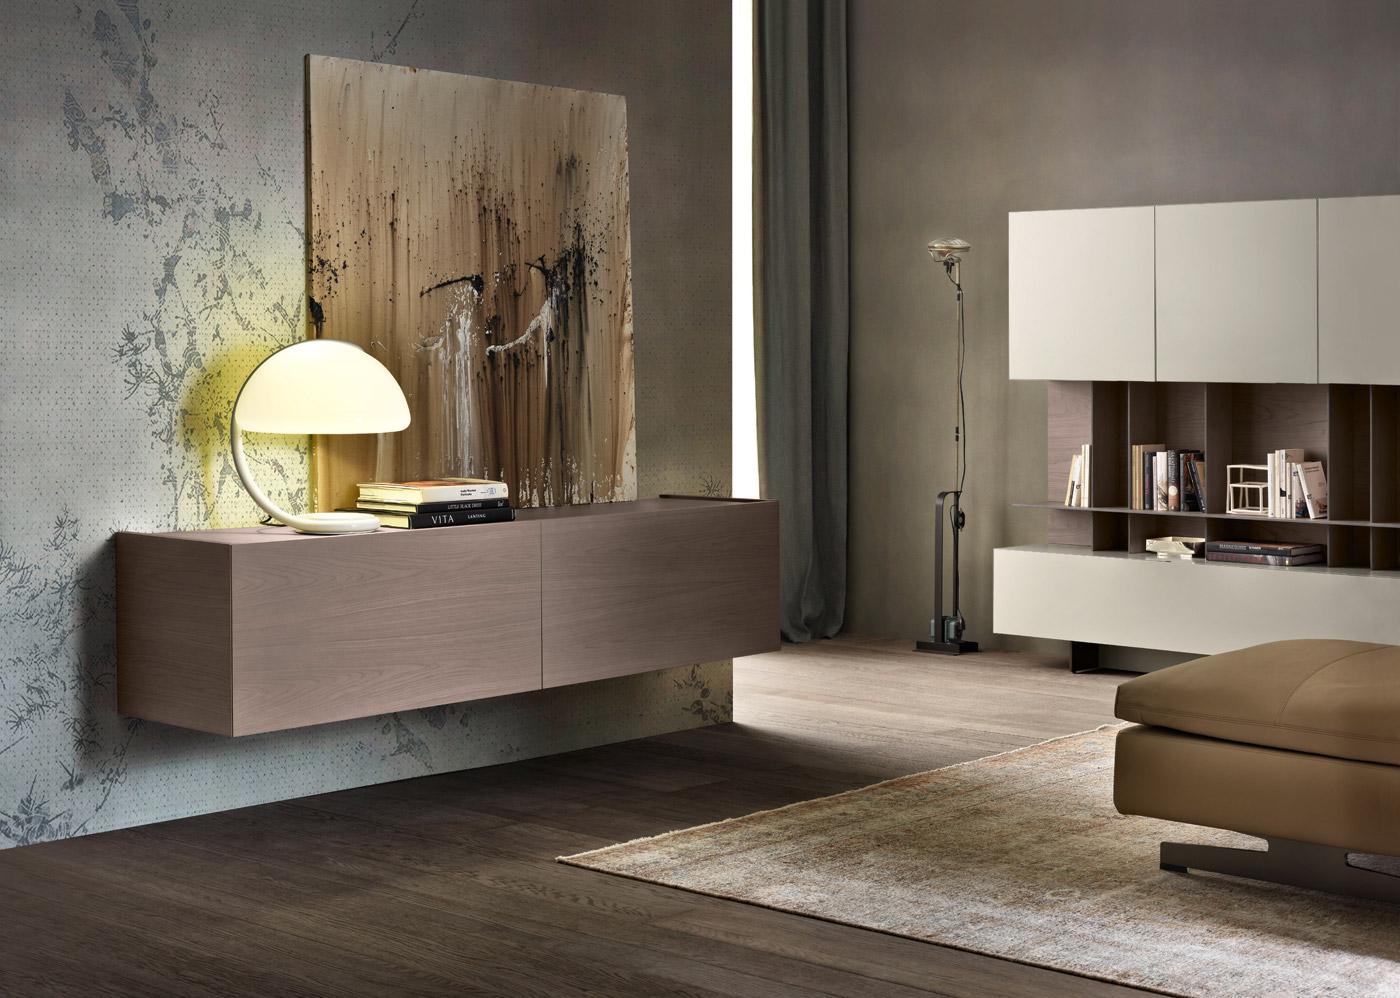 Olivieri mobili furniture design made in italy for Mobili design italia